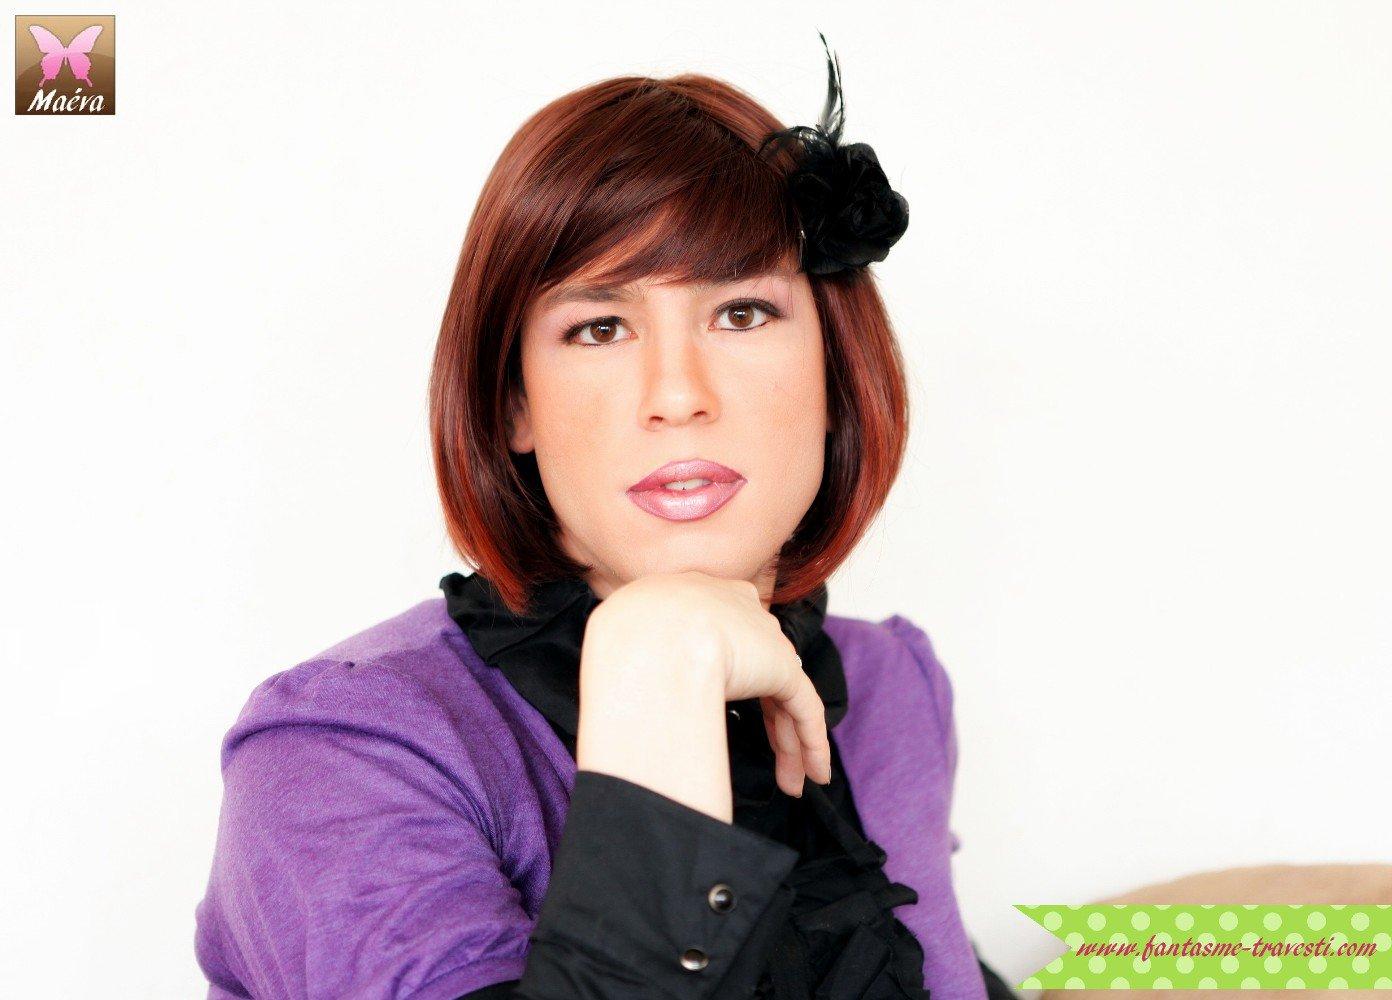 Maeva-travesti-college-style (3)